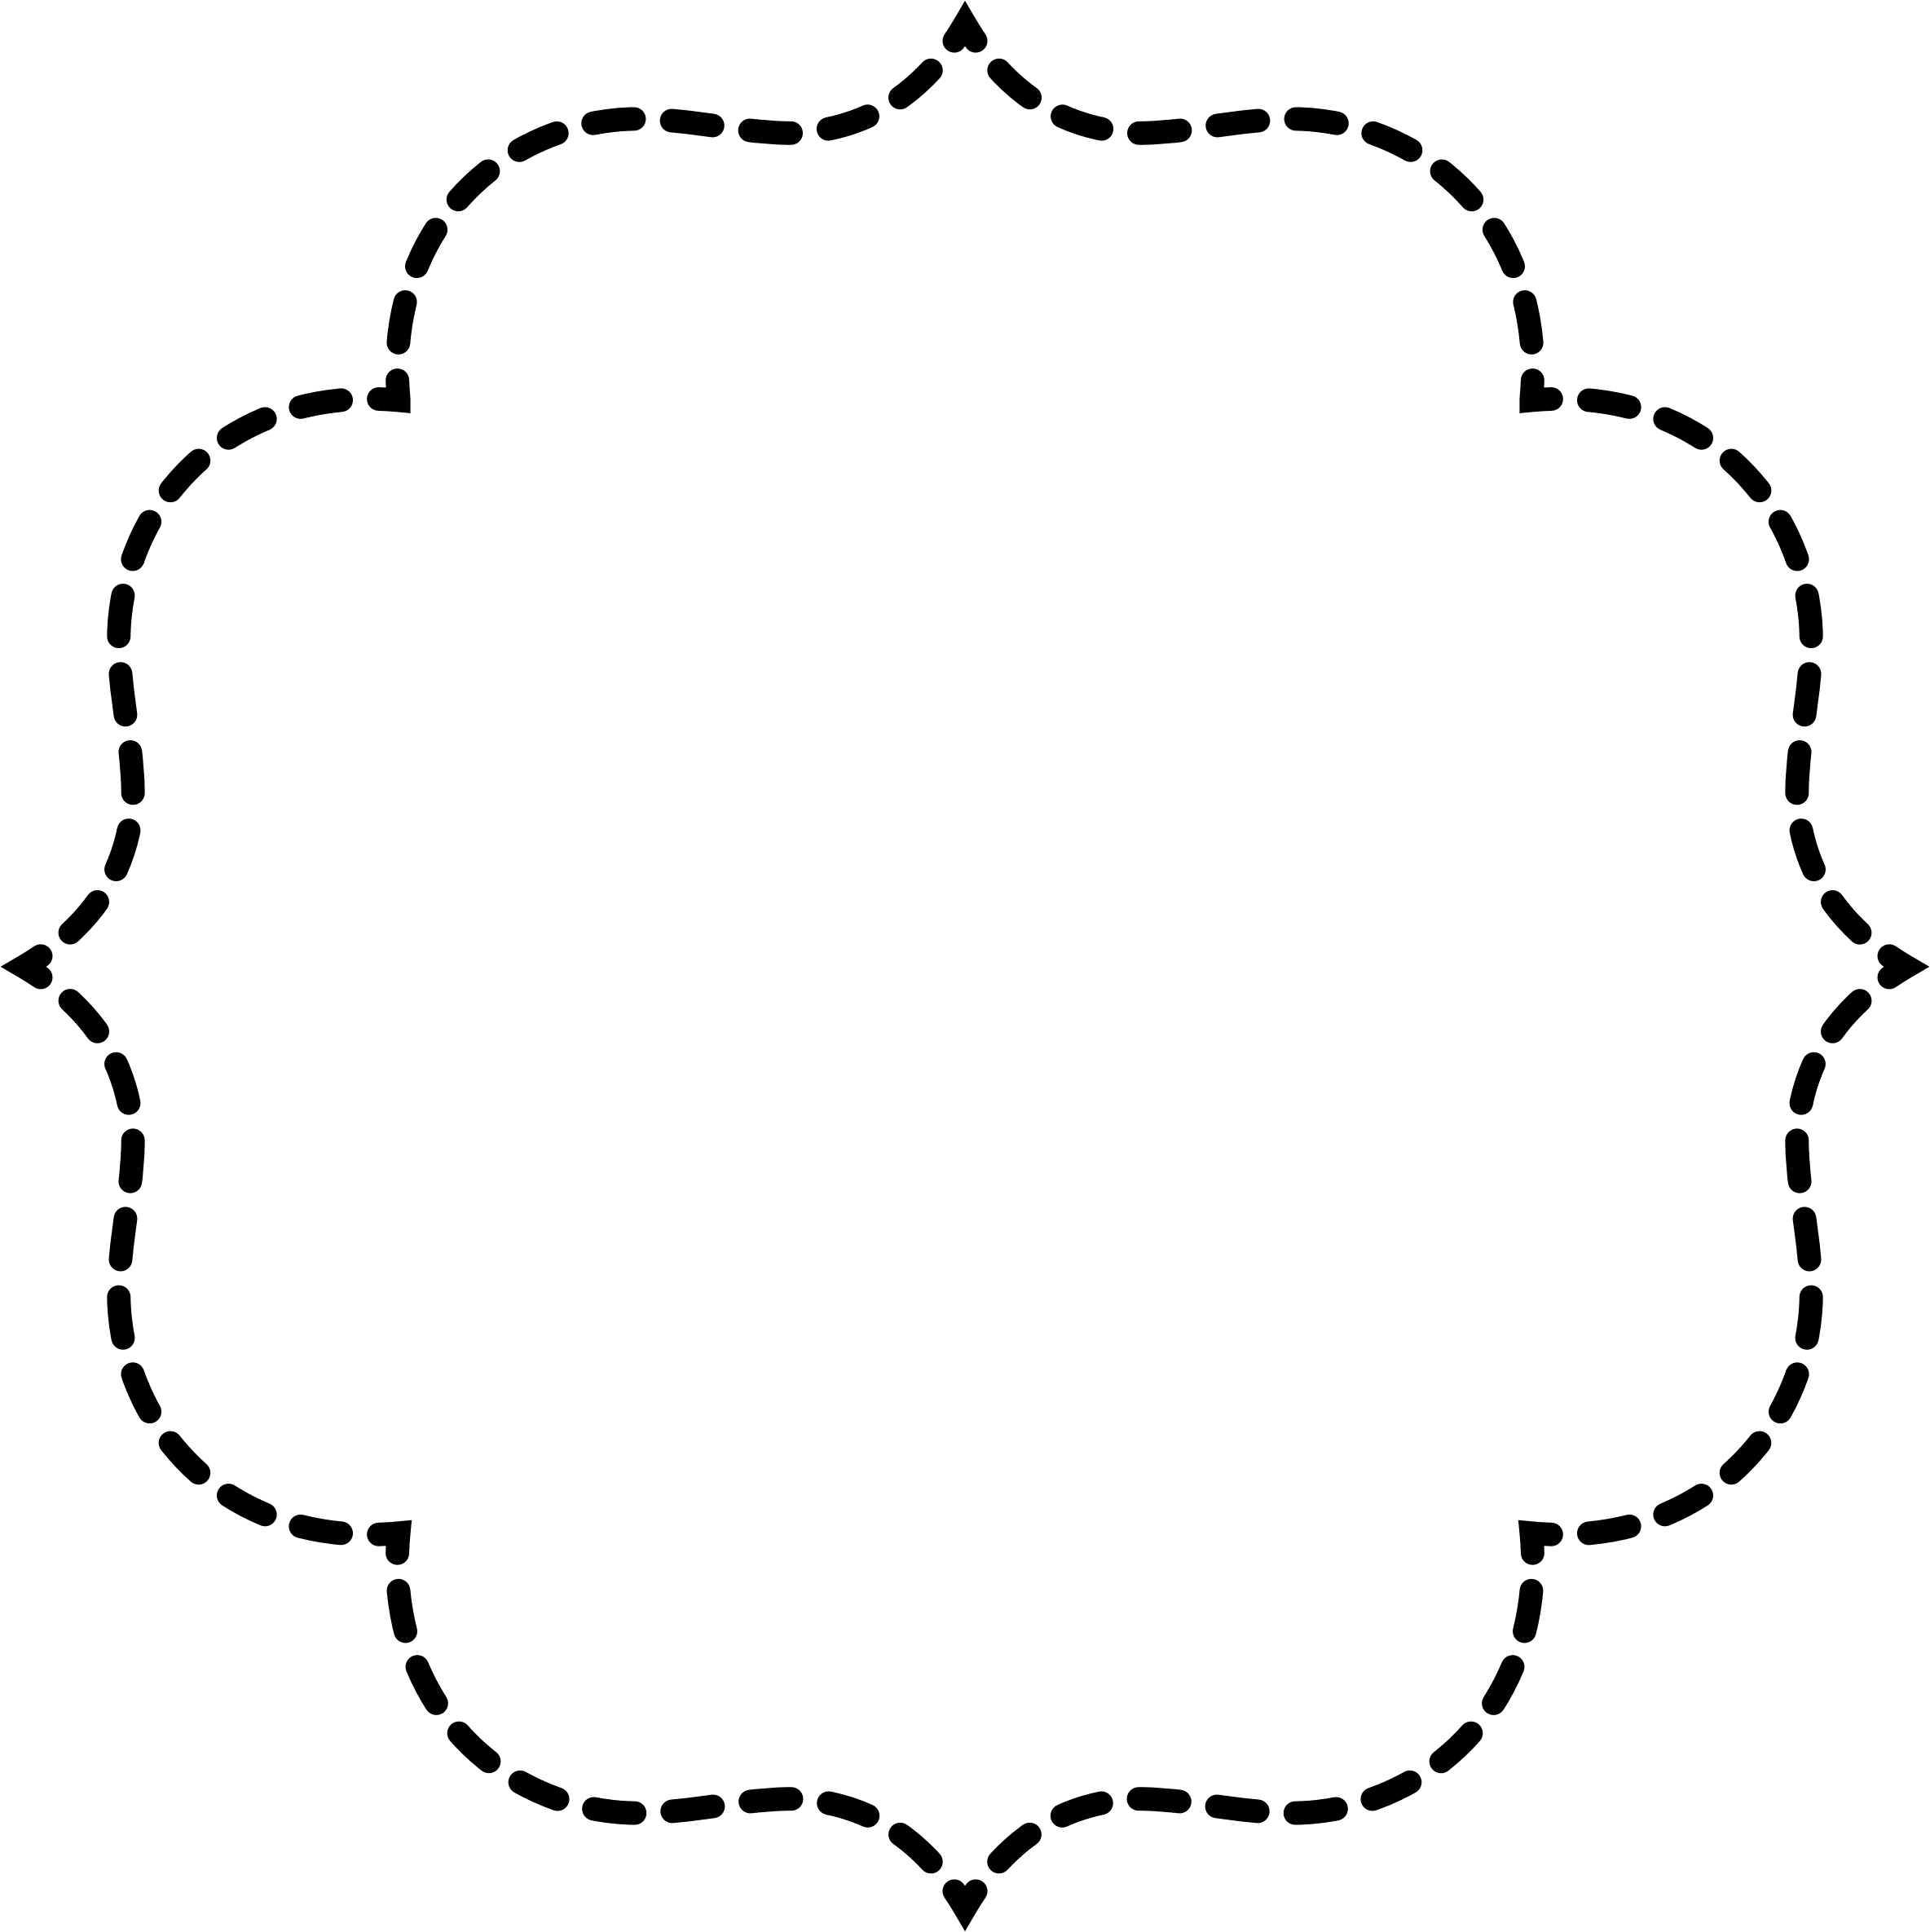 BIG IMAGE (PNG) - Shape PNG